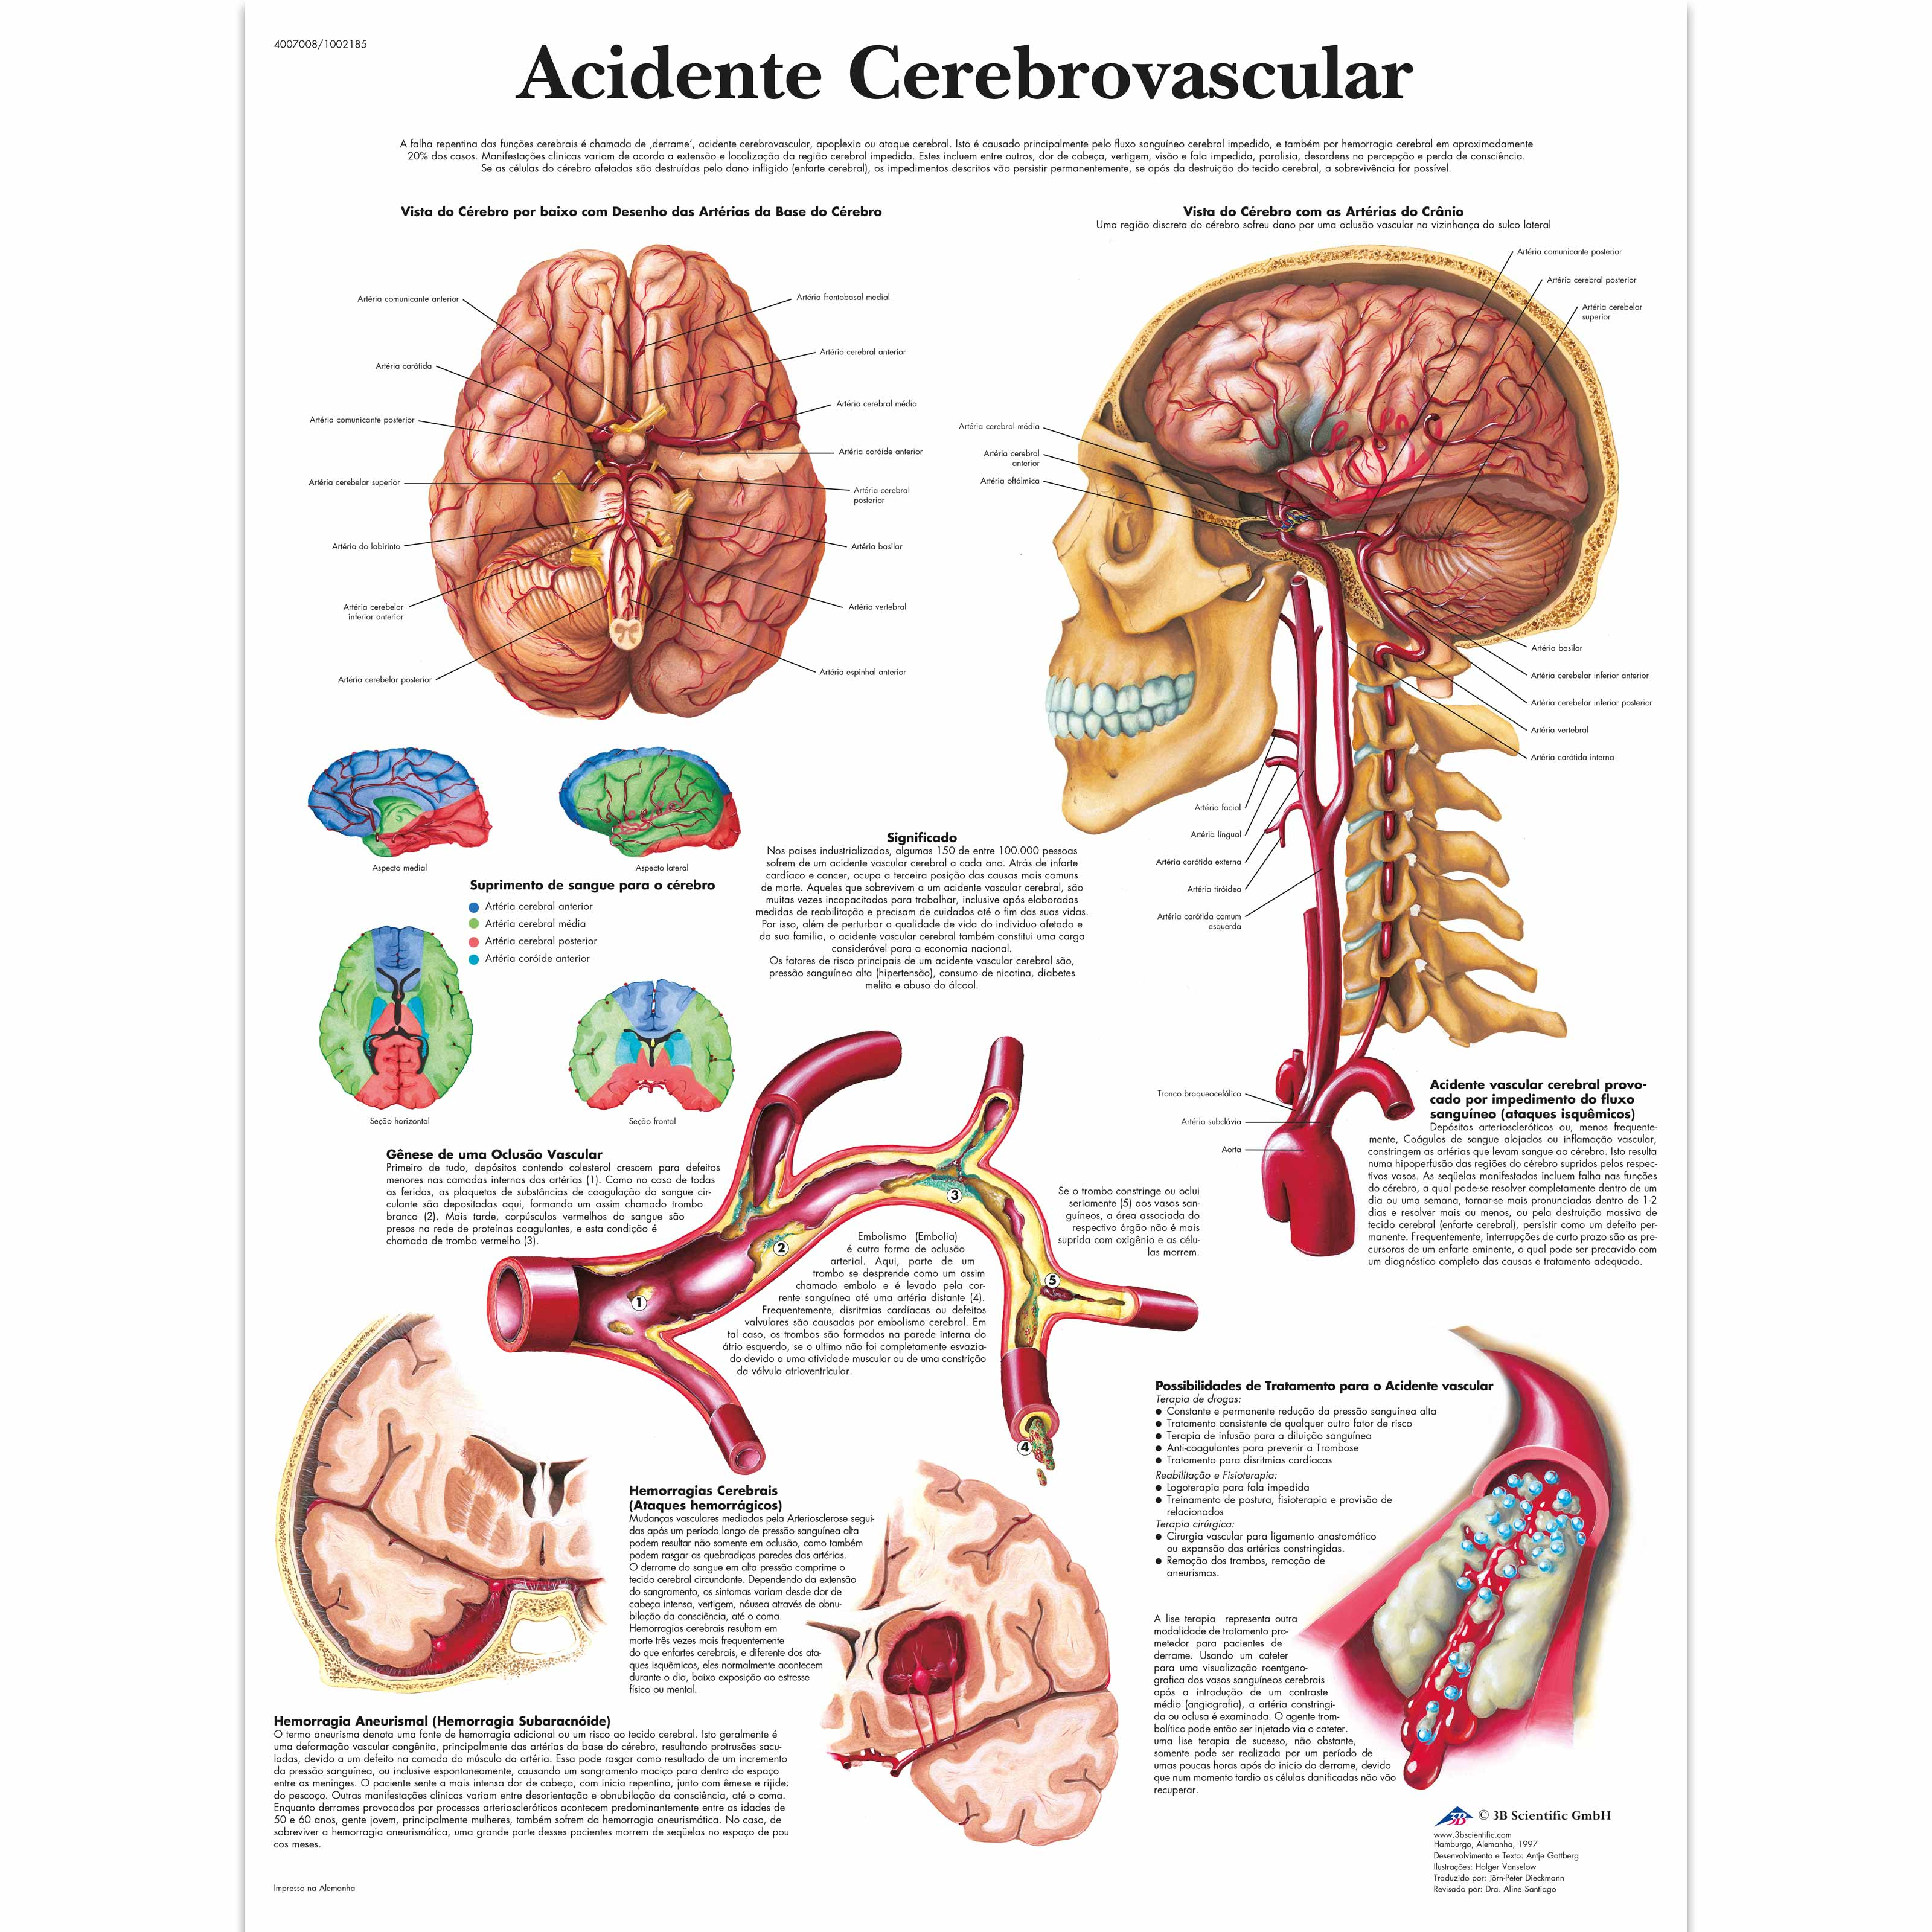 Acid. Cerebrovascular, 50x67 cm, Laminado - 1002185 - VR5627L ...